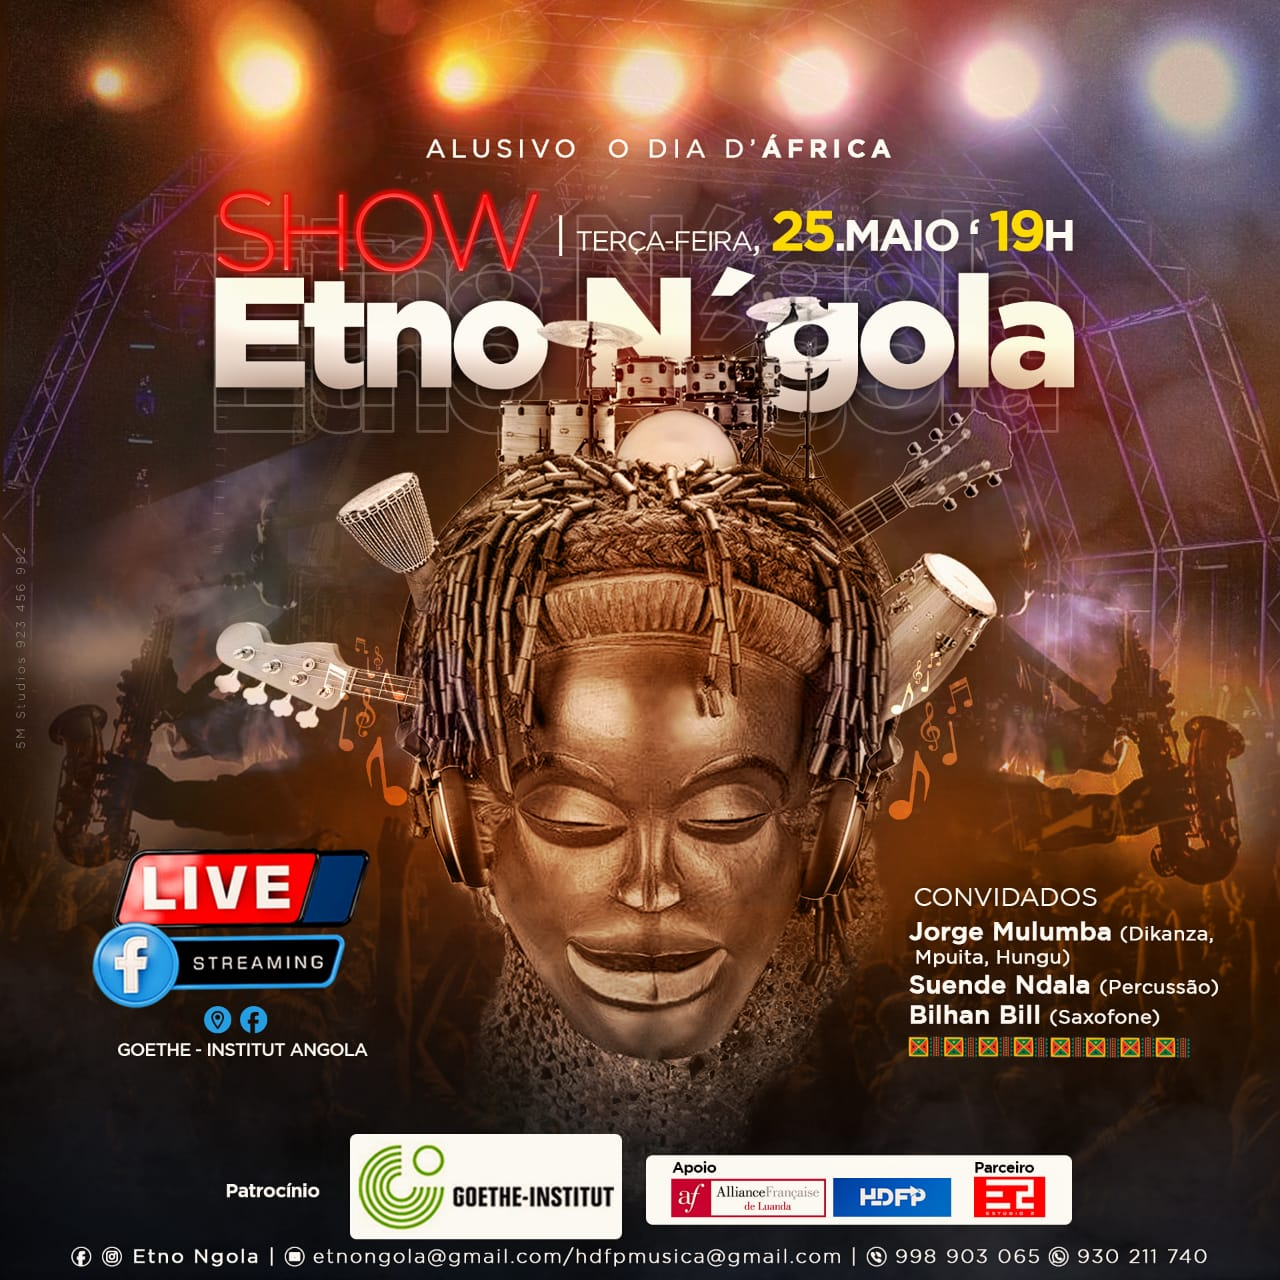 Etno N'gola anuncia show alusivo ao dia de África